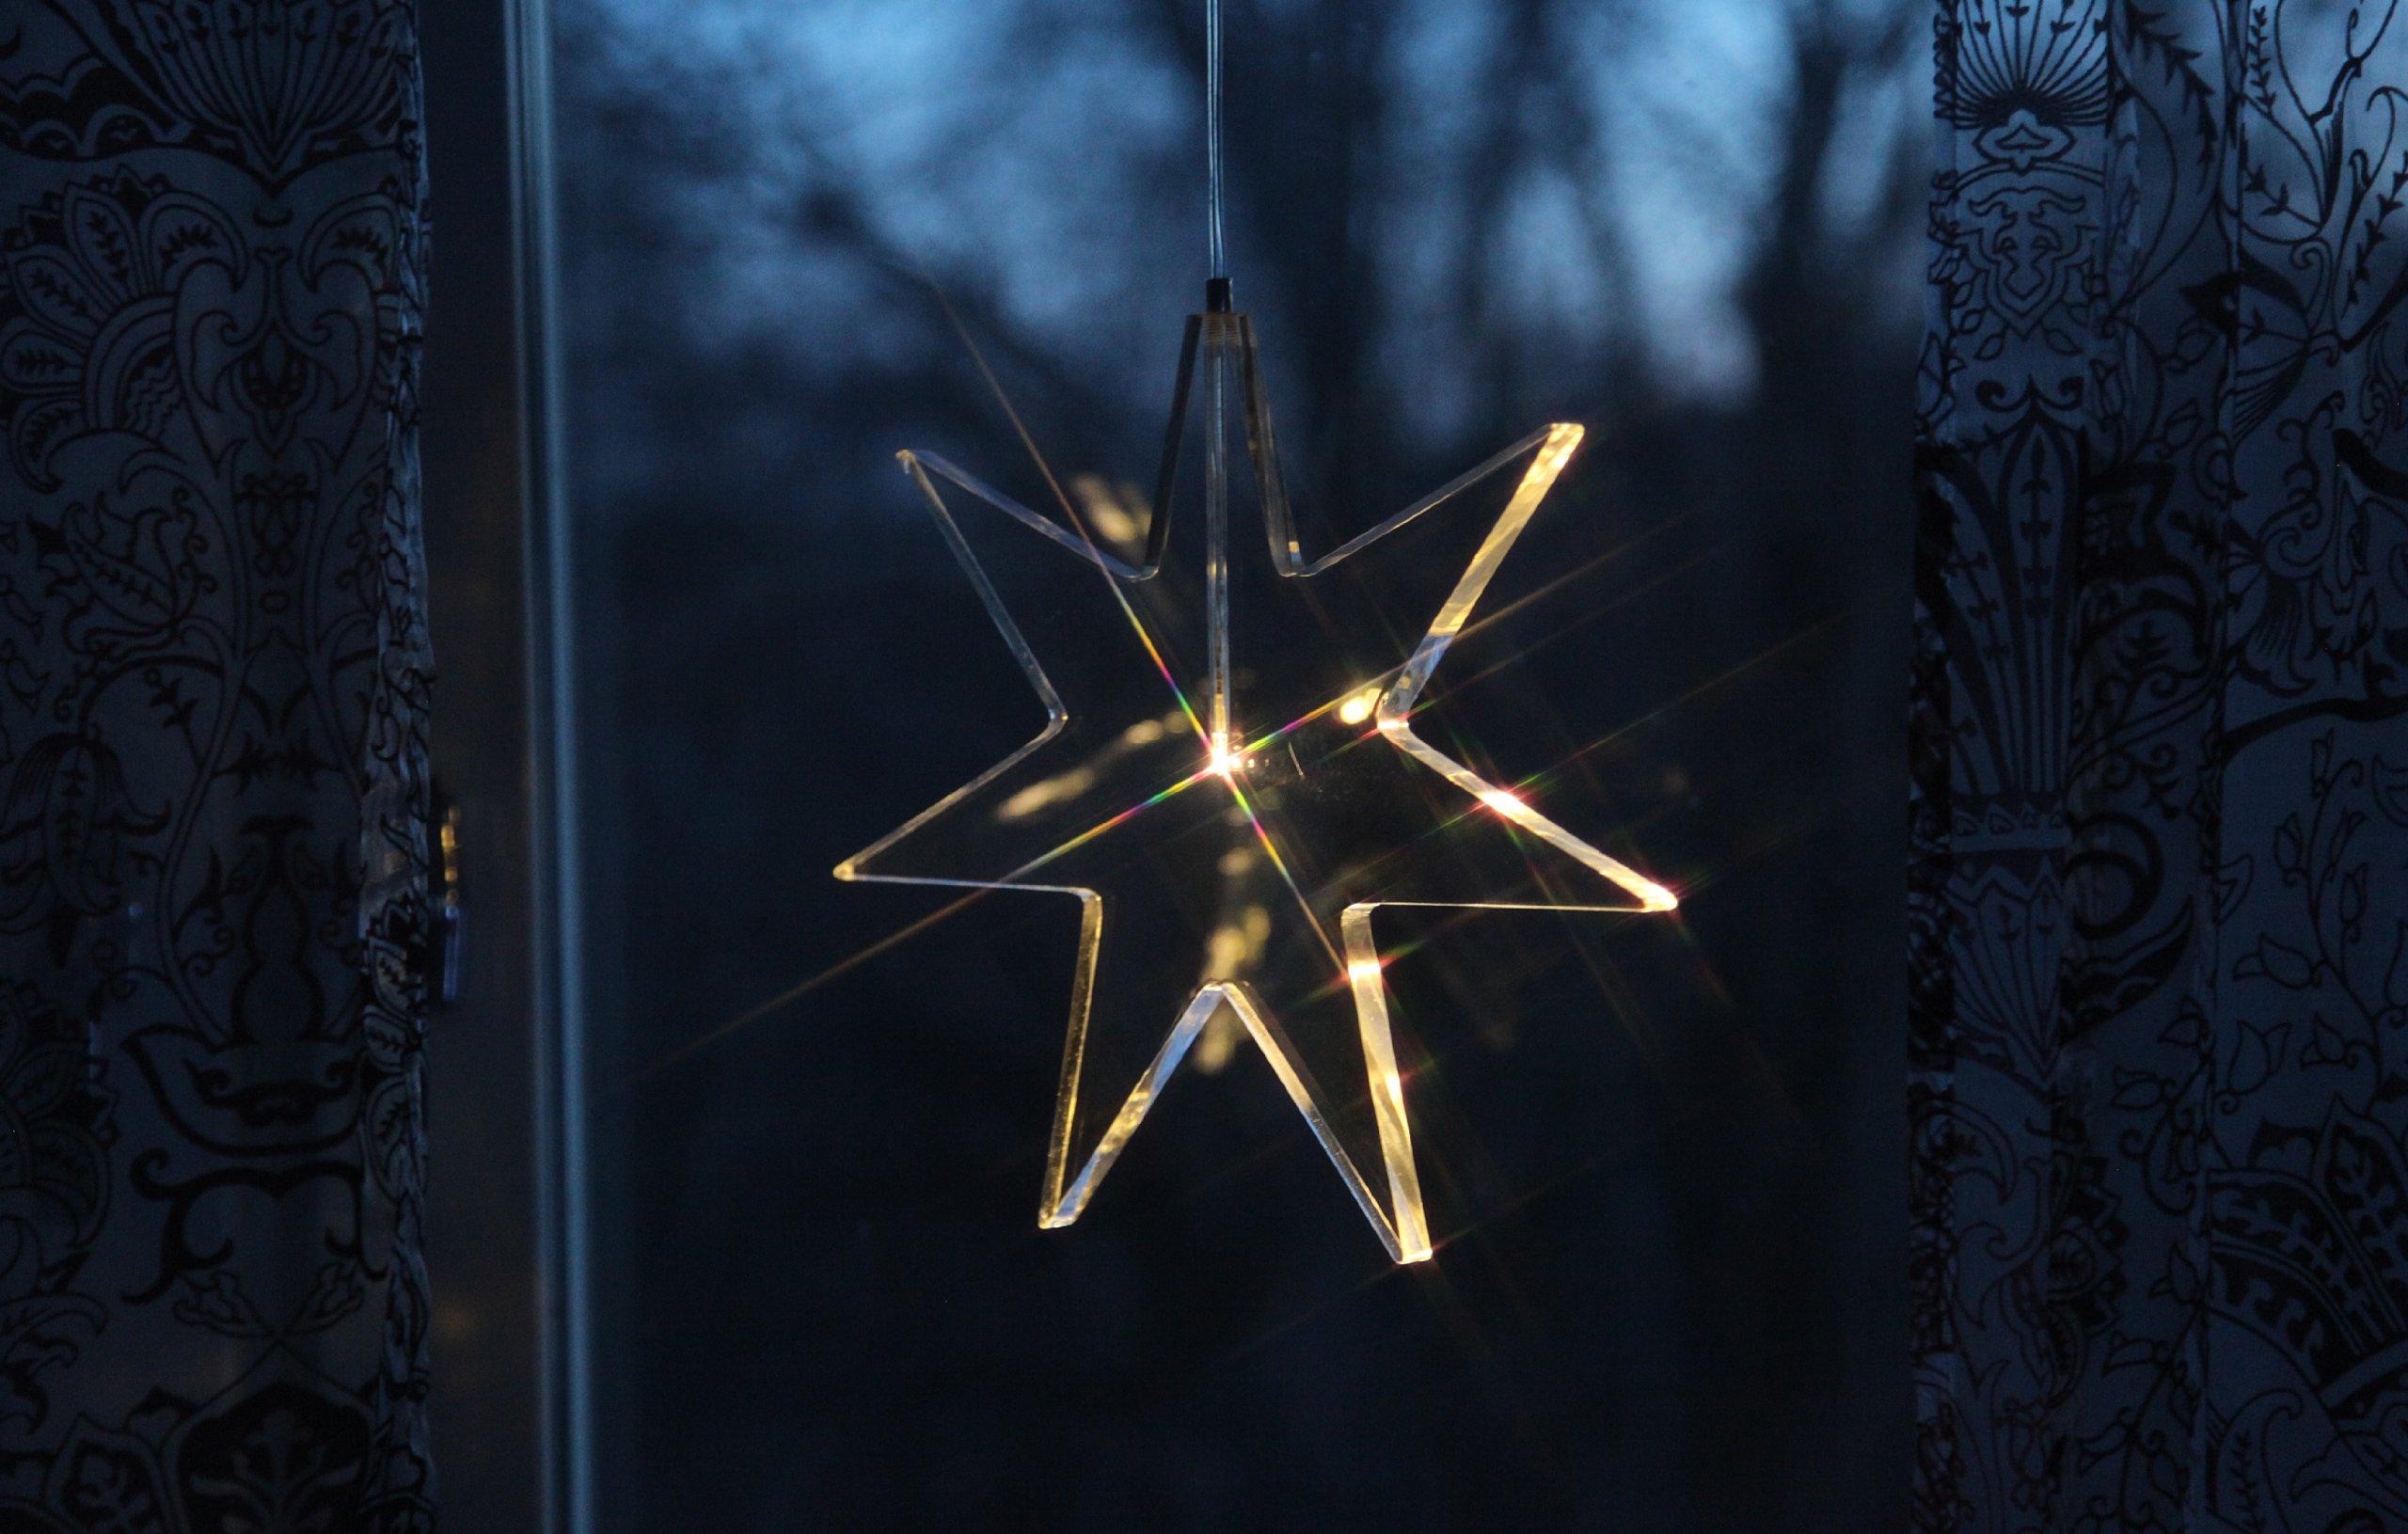 Best-Season-LED-AcrysternKarla-transparent-1-warmwei-LED-circa-25-x-25-cm-mit-Trafo-Vierfarb-Karton-697-50